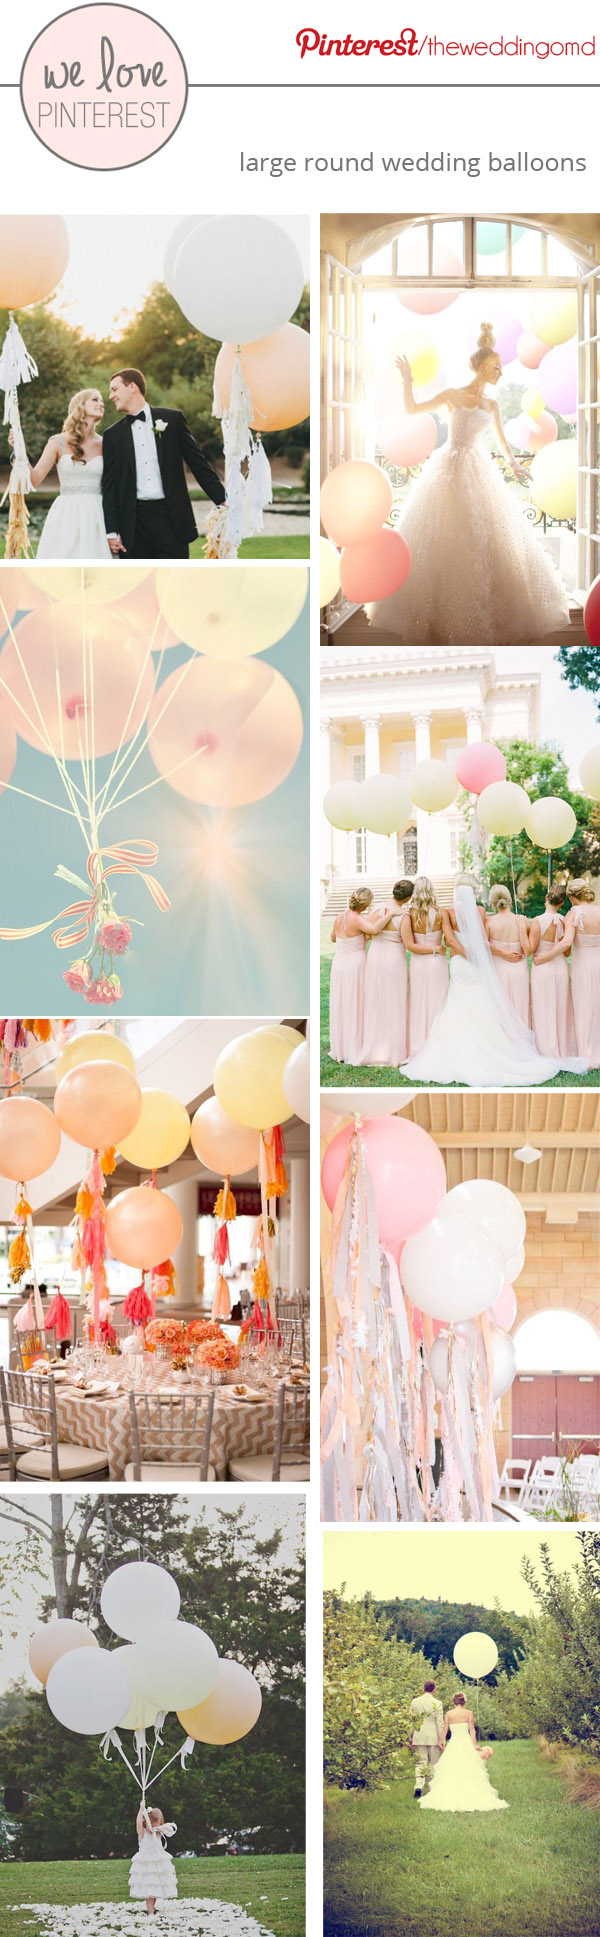 large round wedding balloons